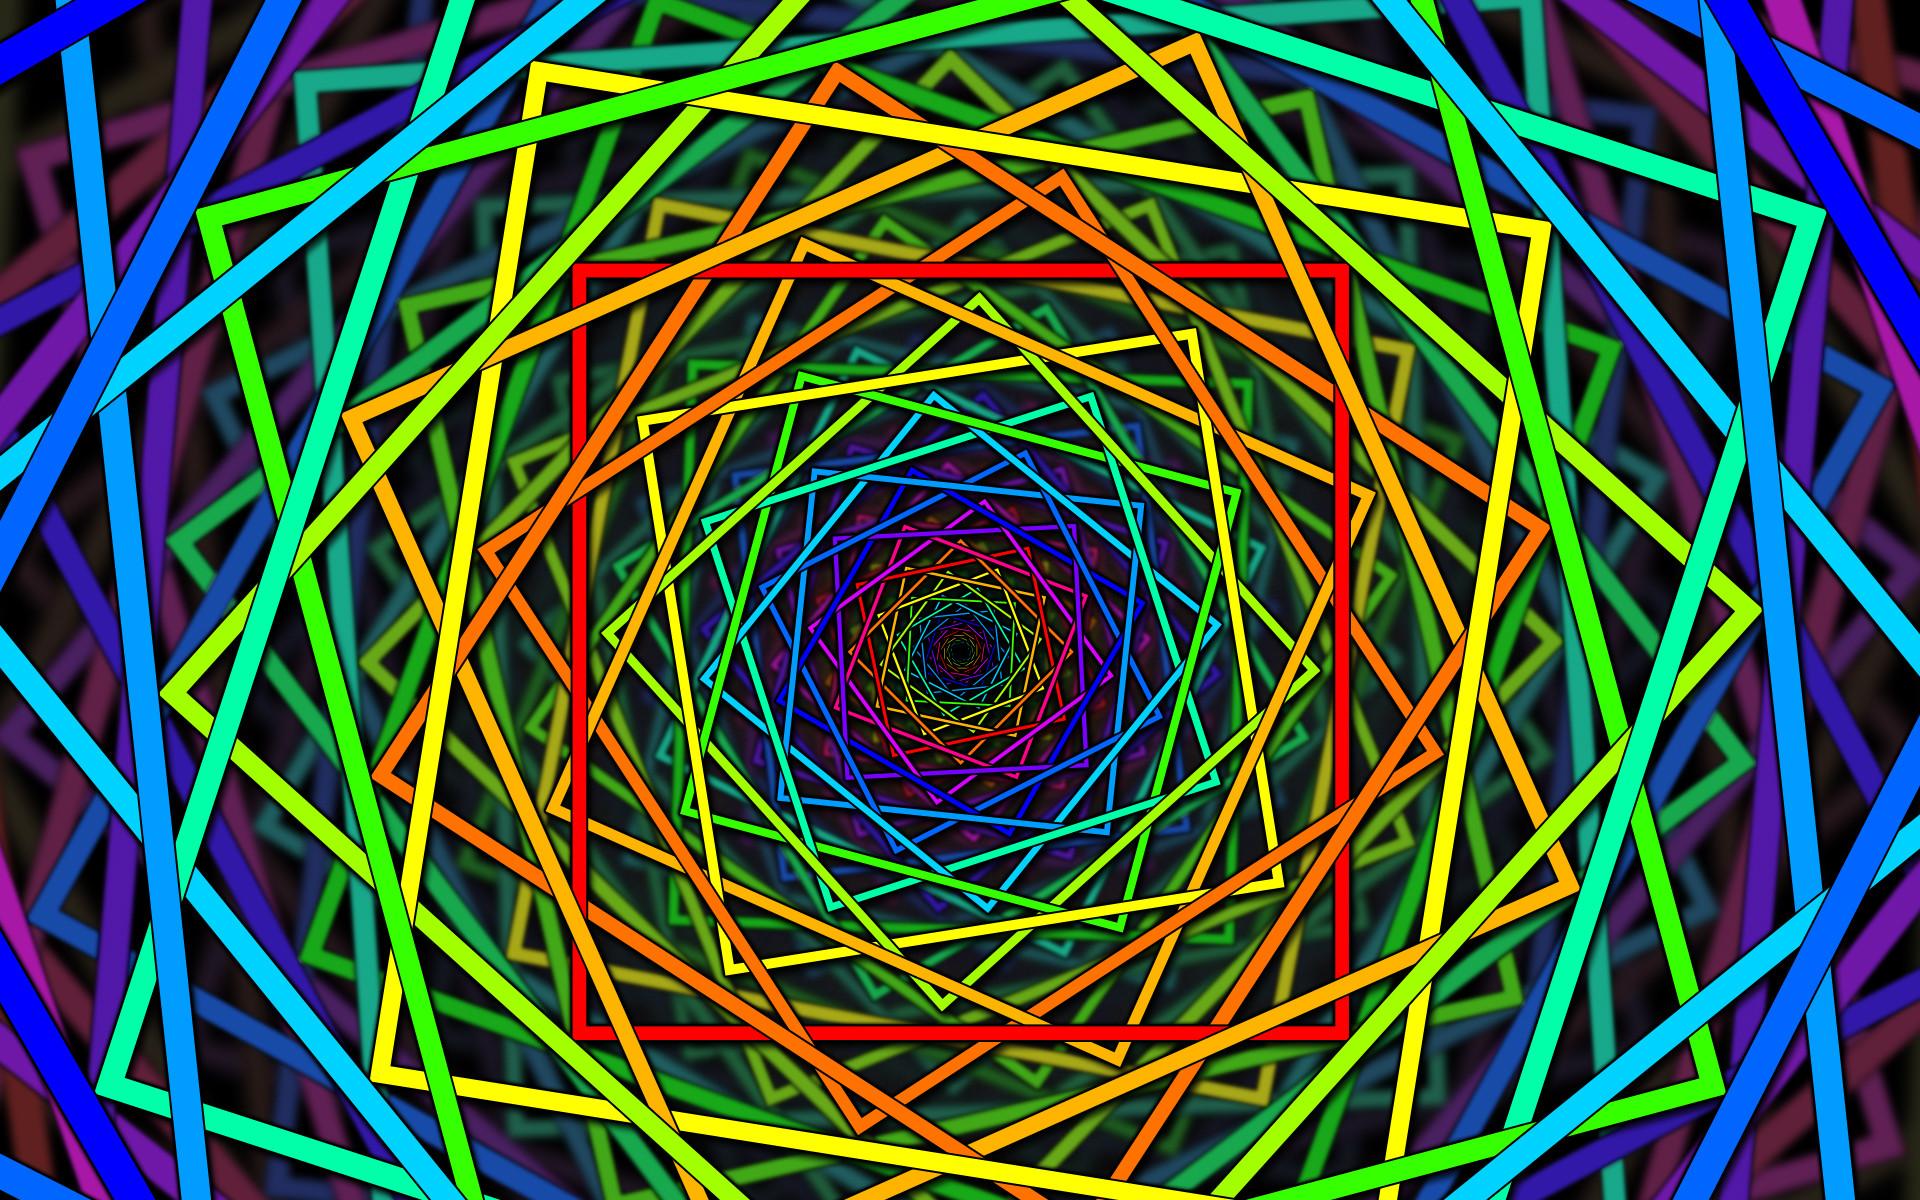 Digital-art-colorful-abstract-wallpaper-hd-widescreen-wallpapers2.jpg